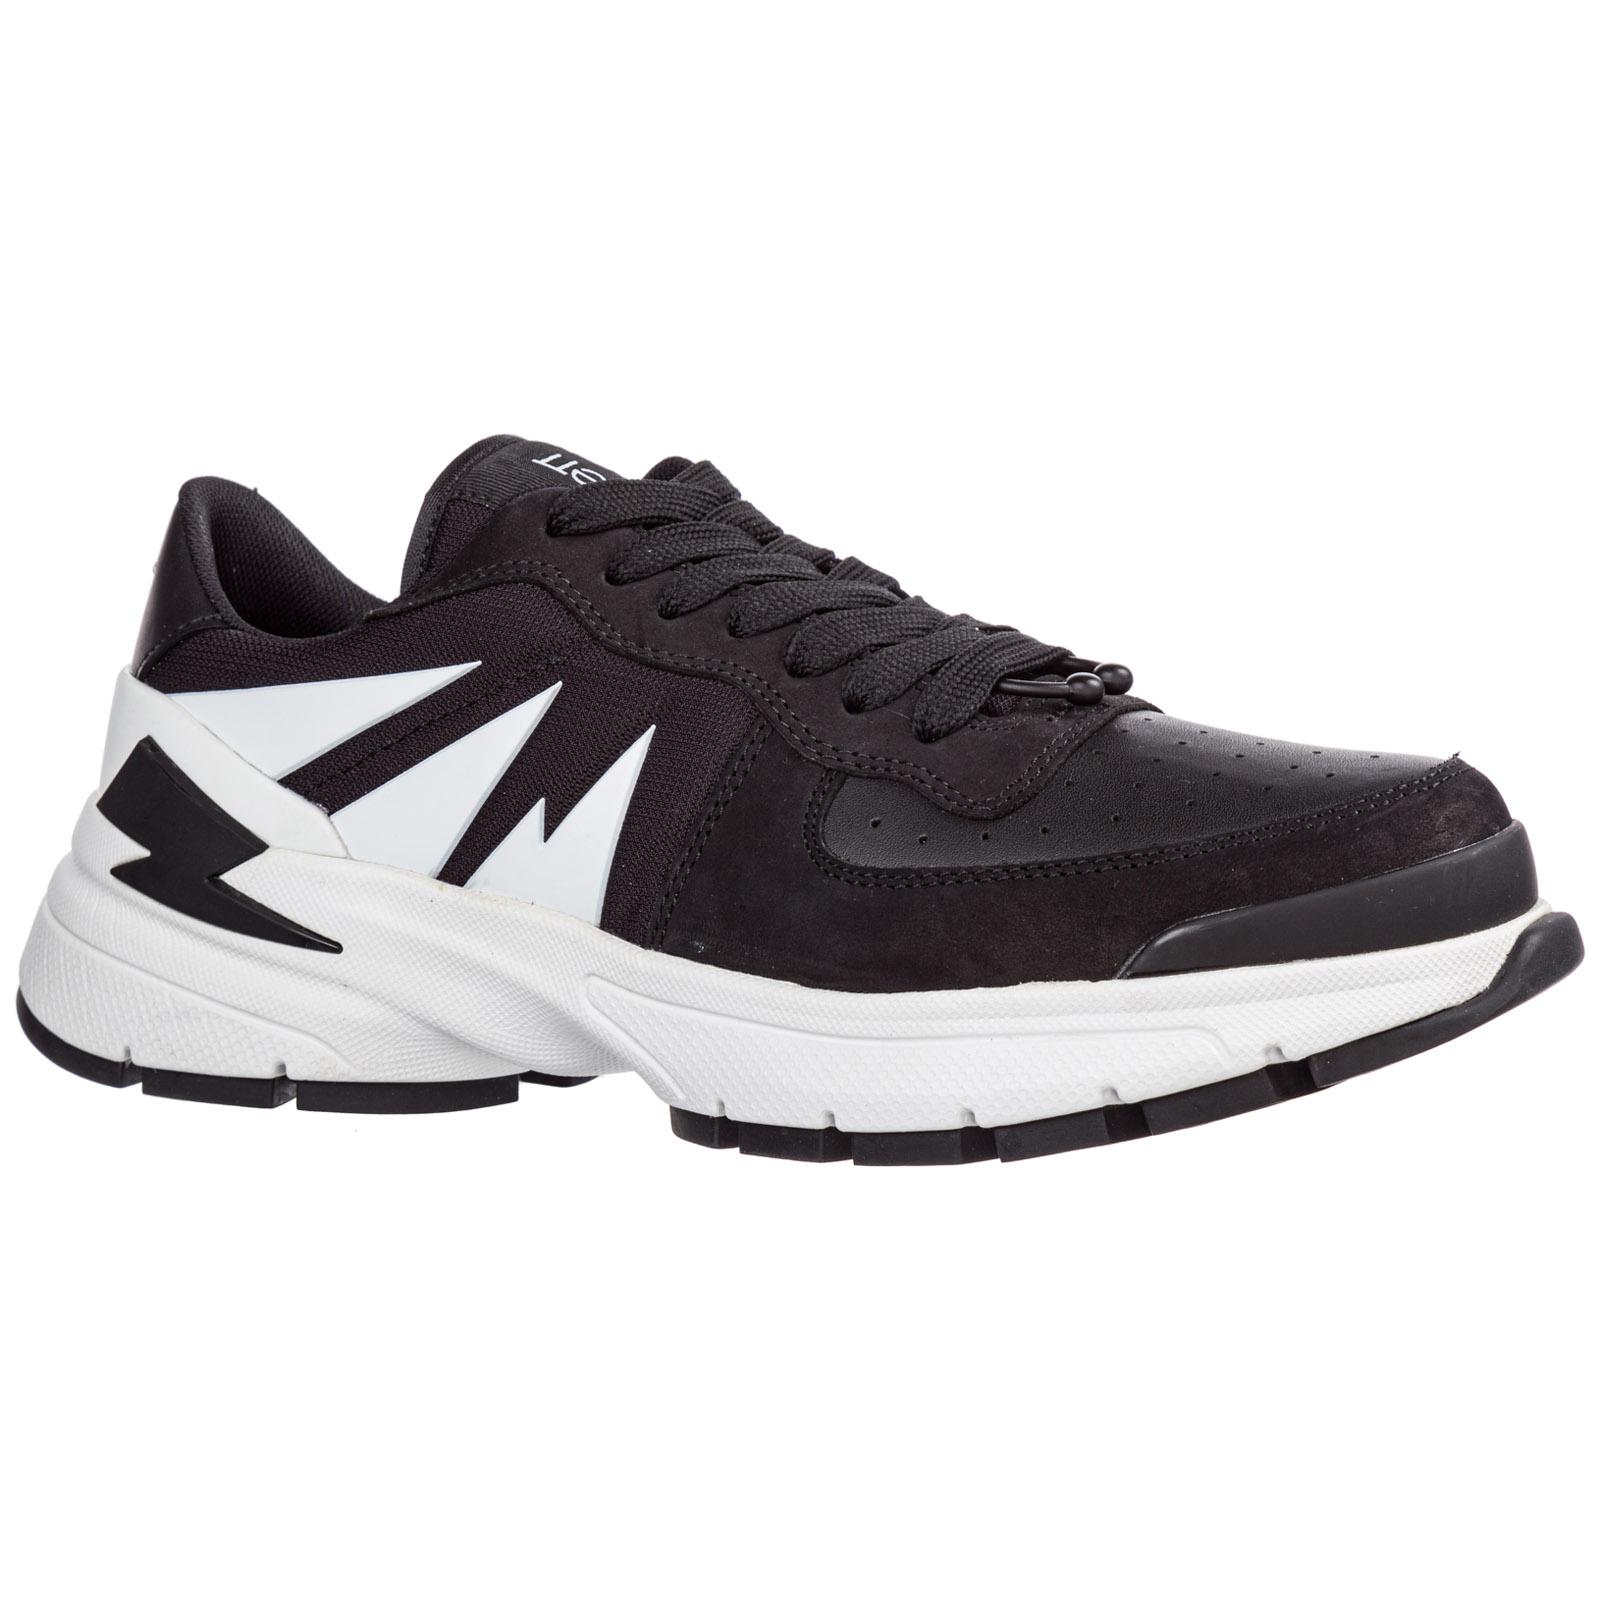 Chaussures baskets sneakers homme en cuir tiger bolt